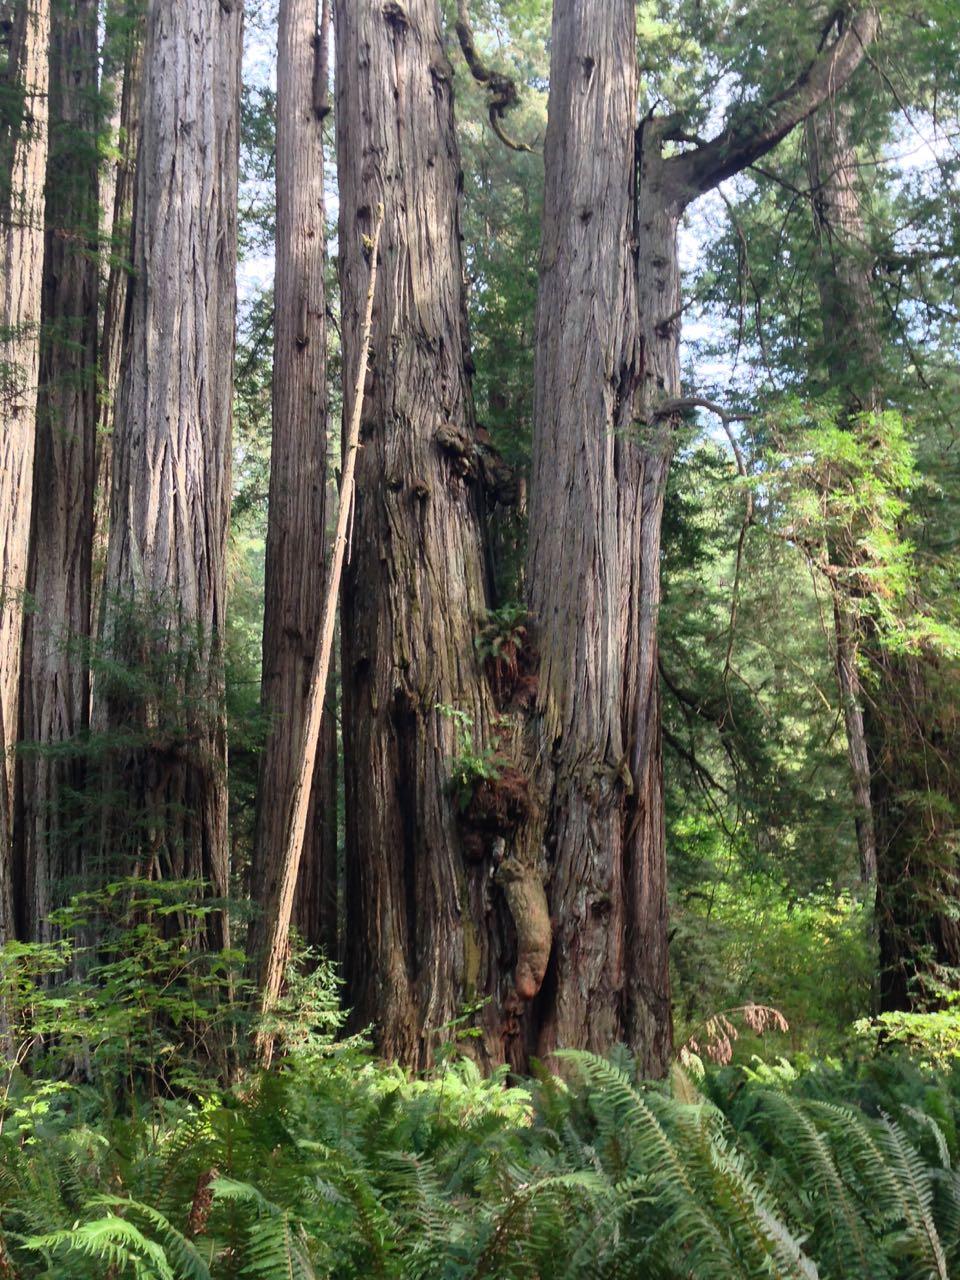 Redwoods 2017 10 08 279 Of 287